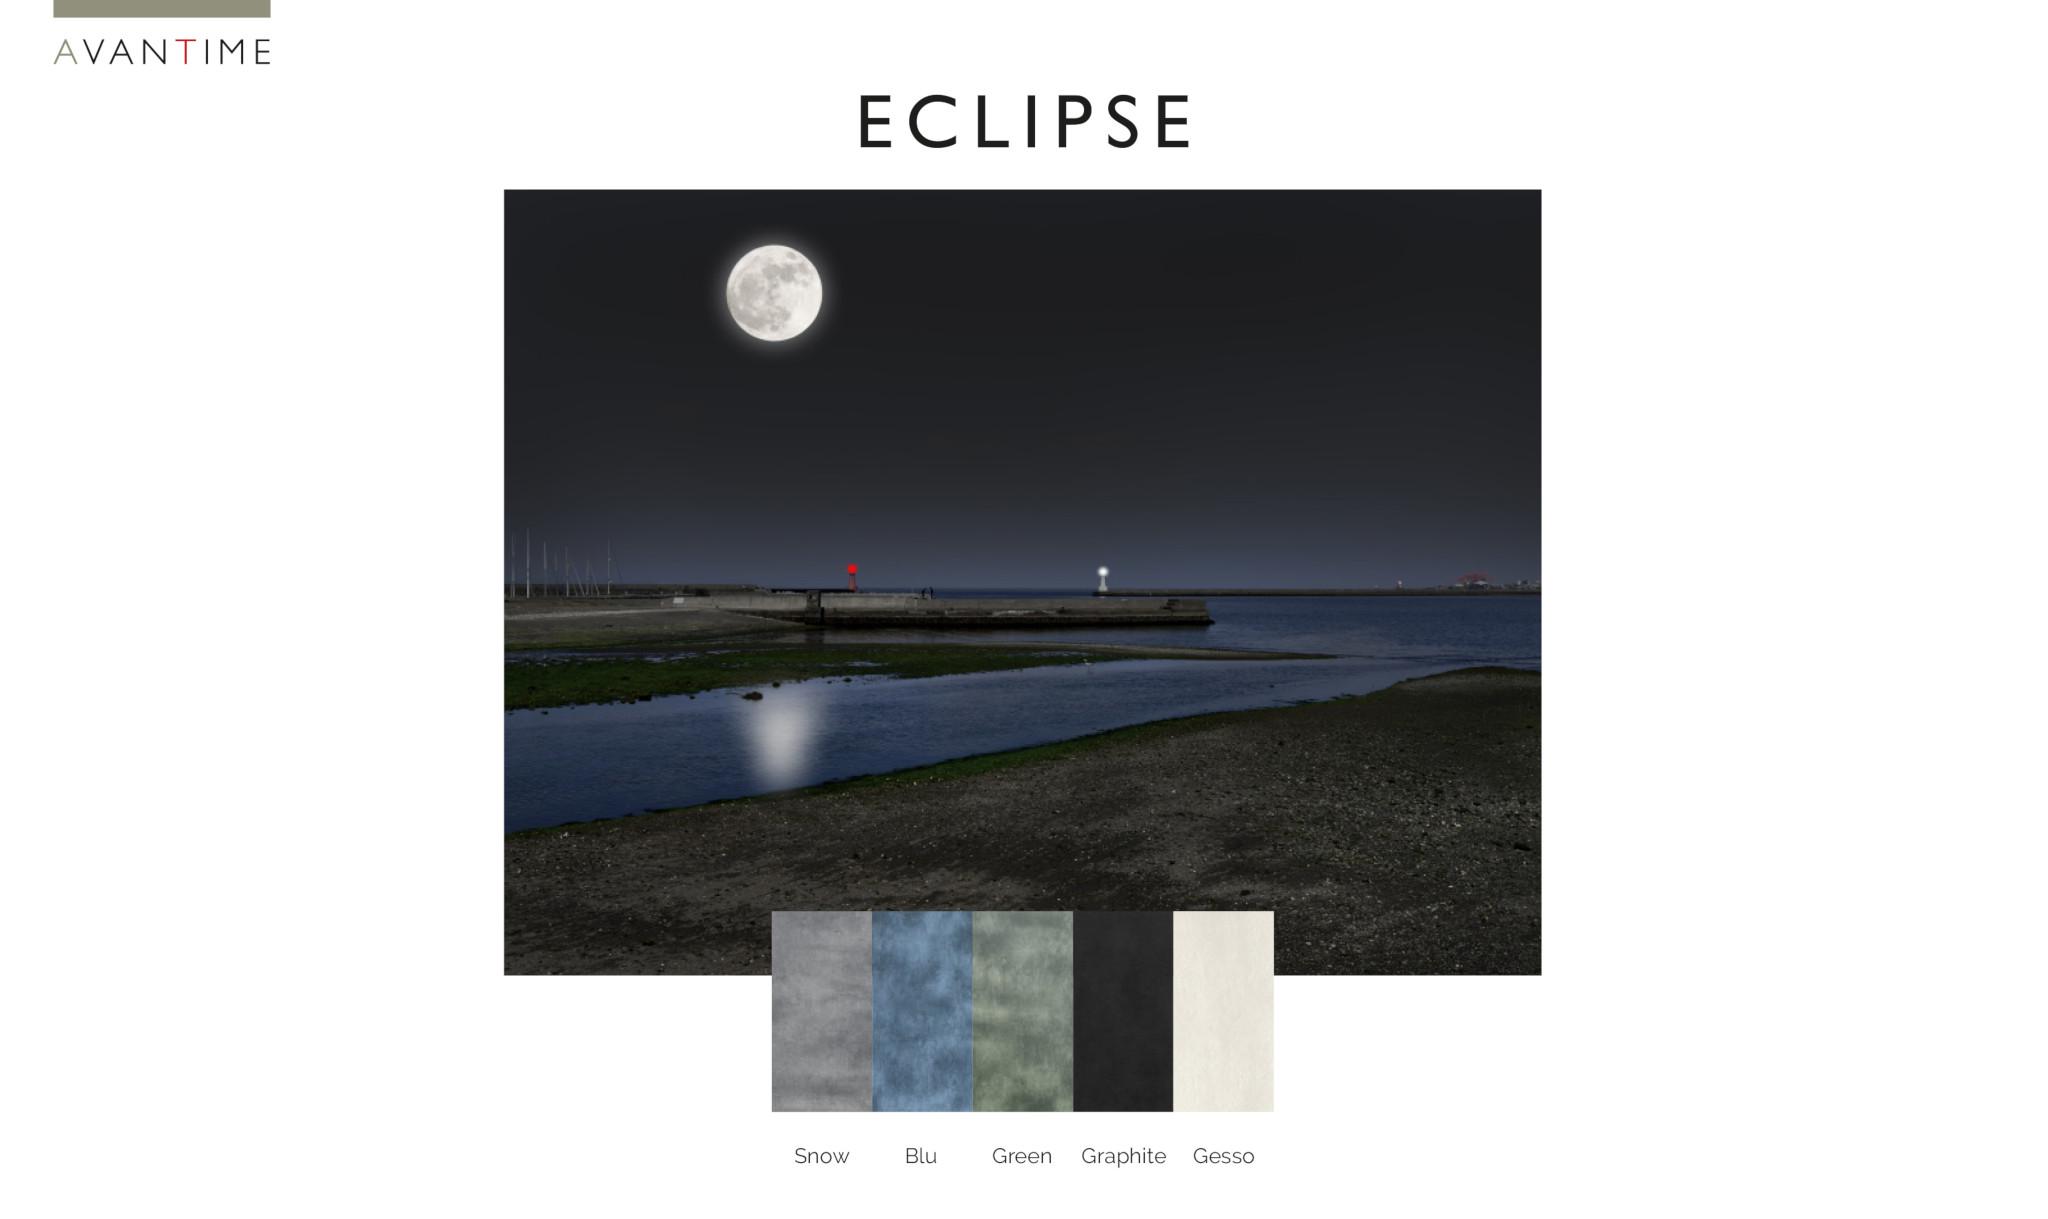 Inspiration Pallette - Eclipse